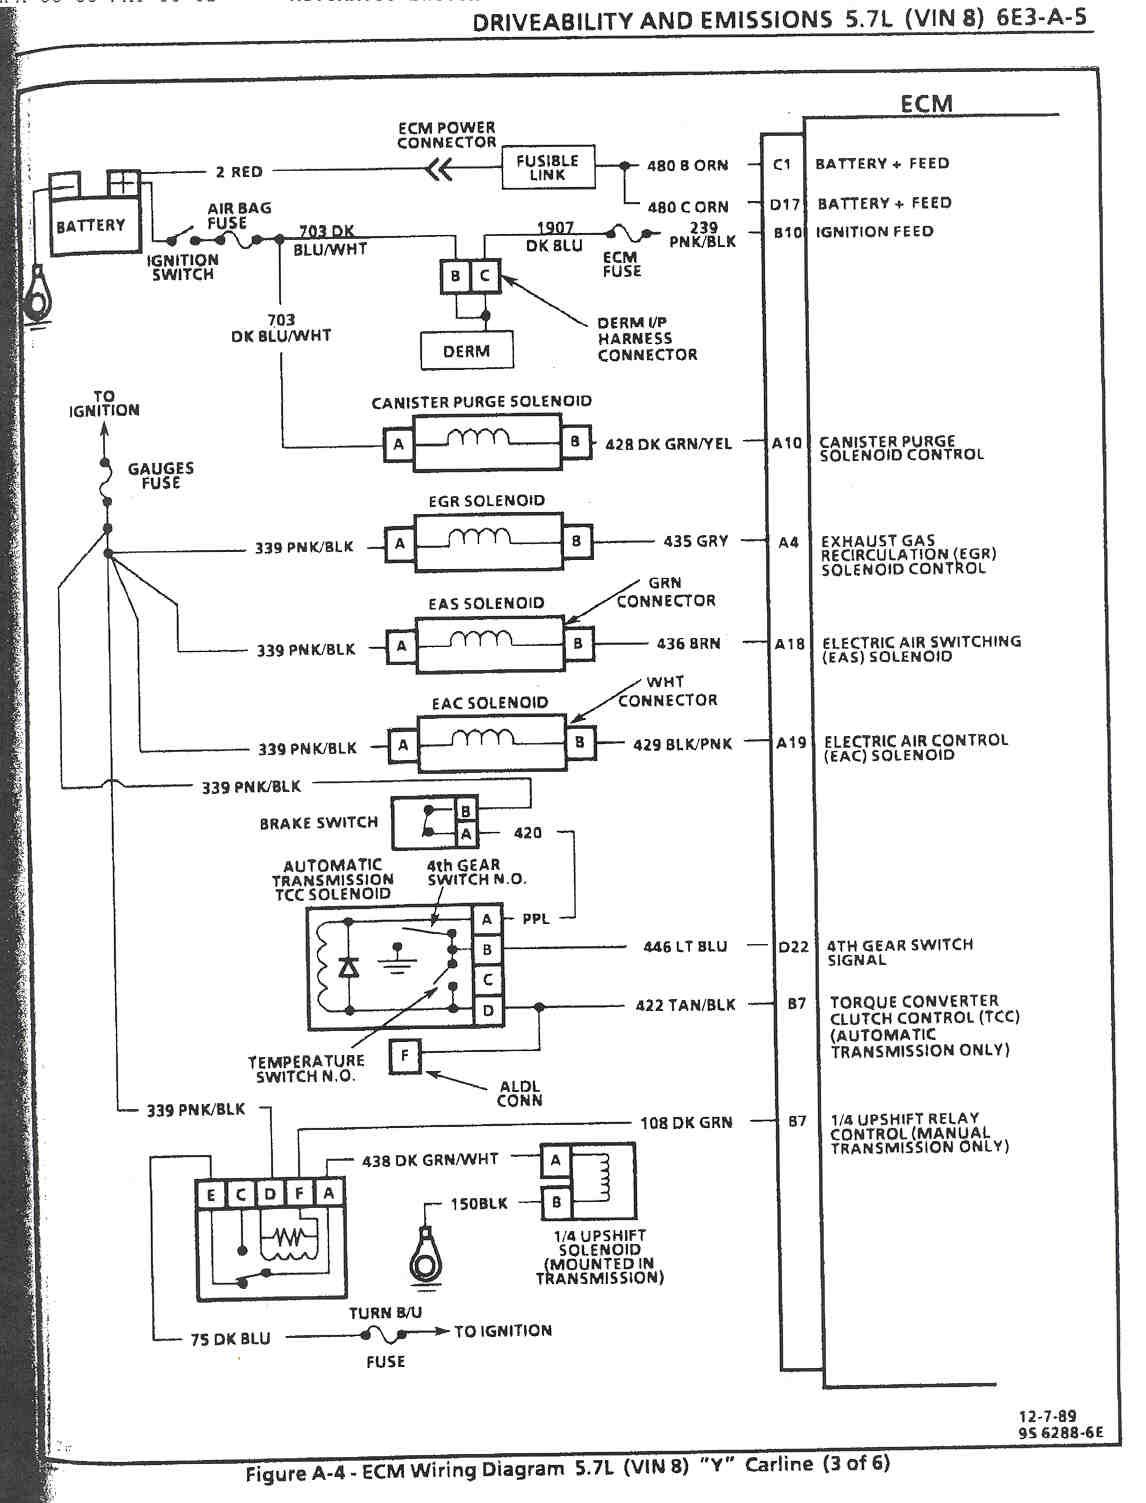 Index Of Gearhead Efi Wiring 339 Diagram 90 7727v8tpi 4